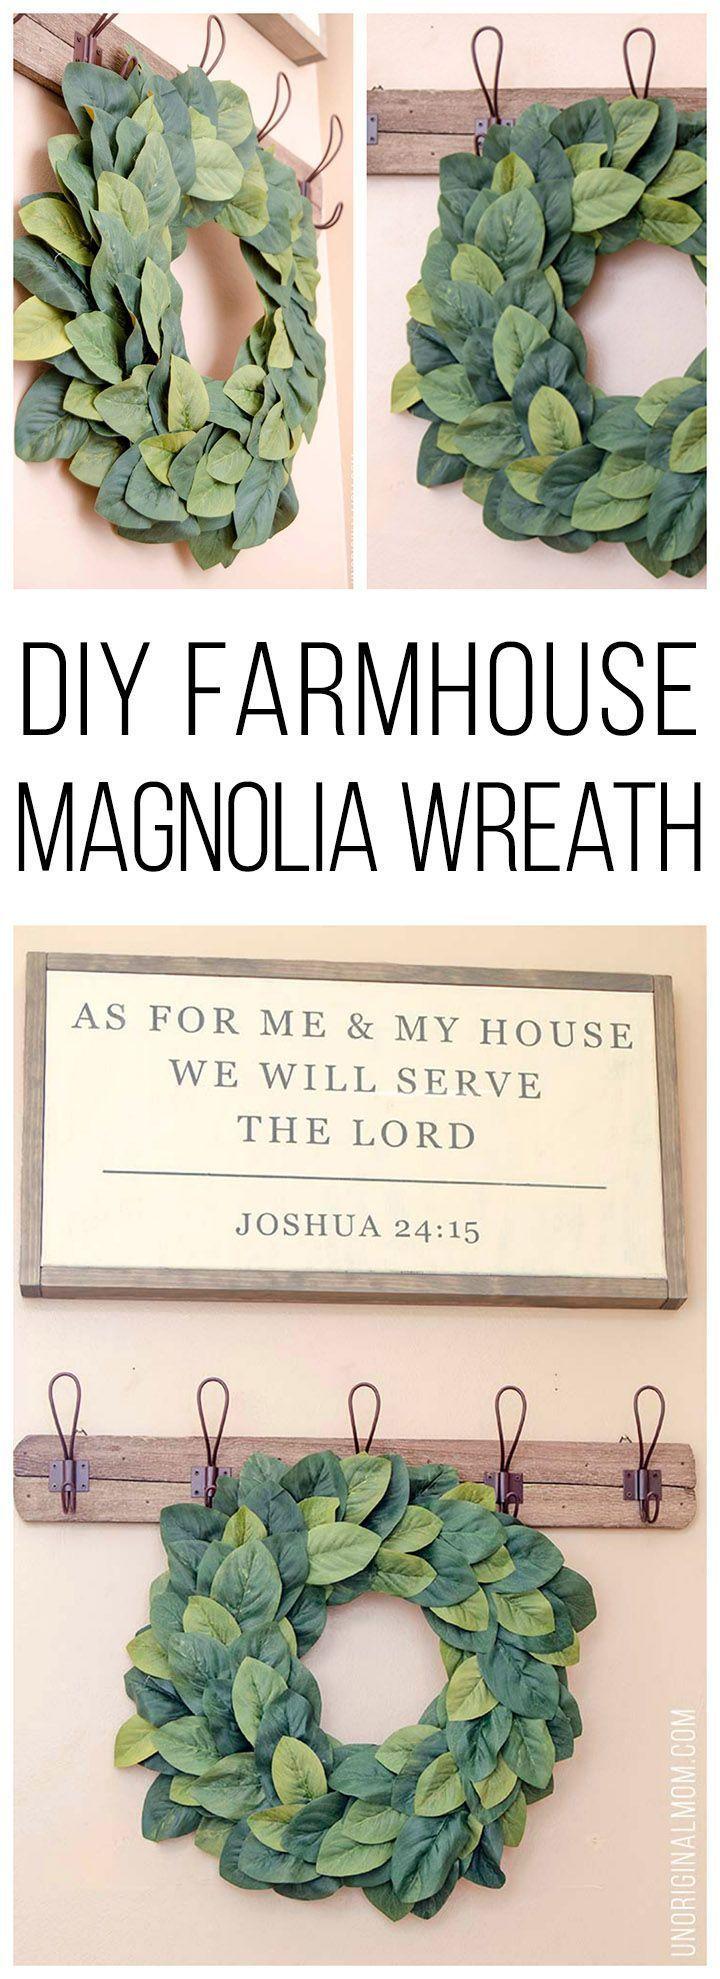 Photo of Finding DIY Home Decor Inspiration: DIY Farmhouse Magnolia Wreath – unOriginal …